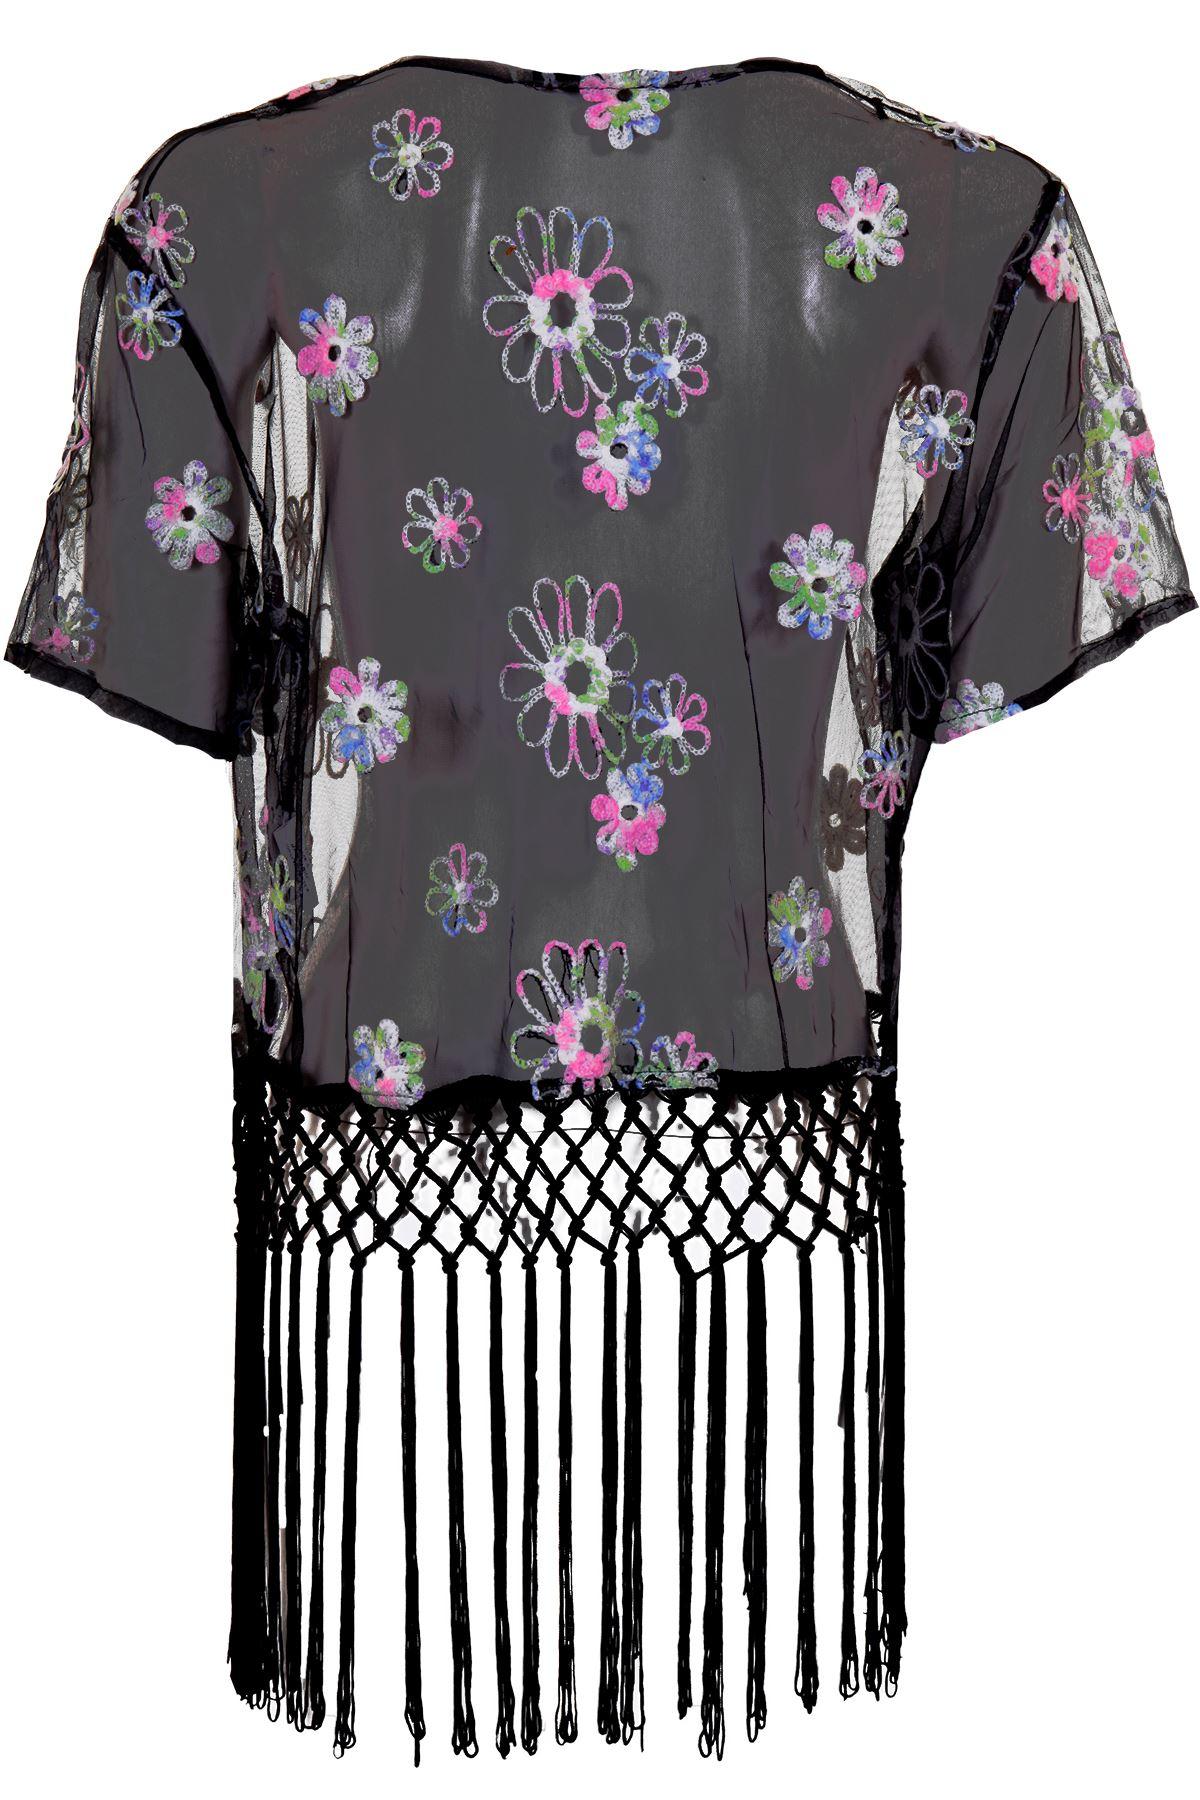 Women's Mesh Translucent Short Sleeve Floral Tasseled Ladies Jacket Kimono